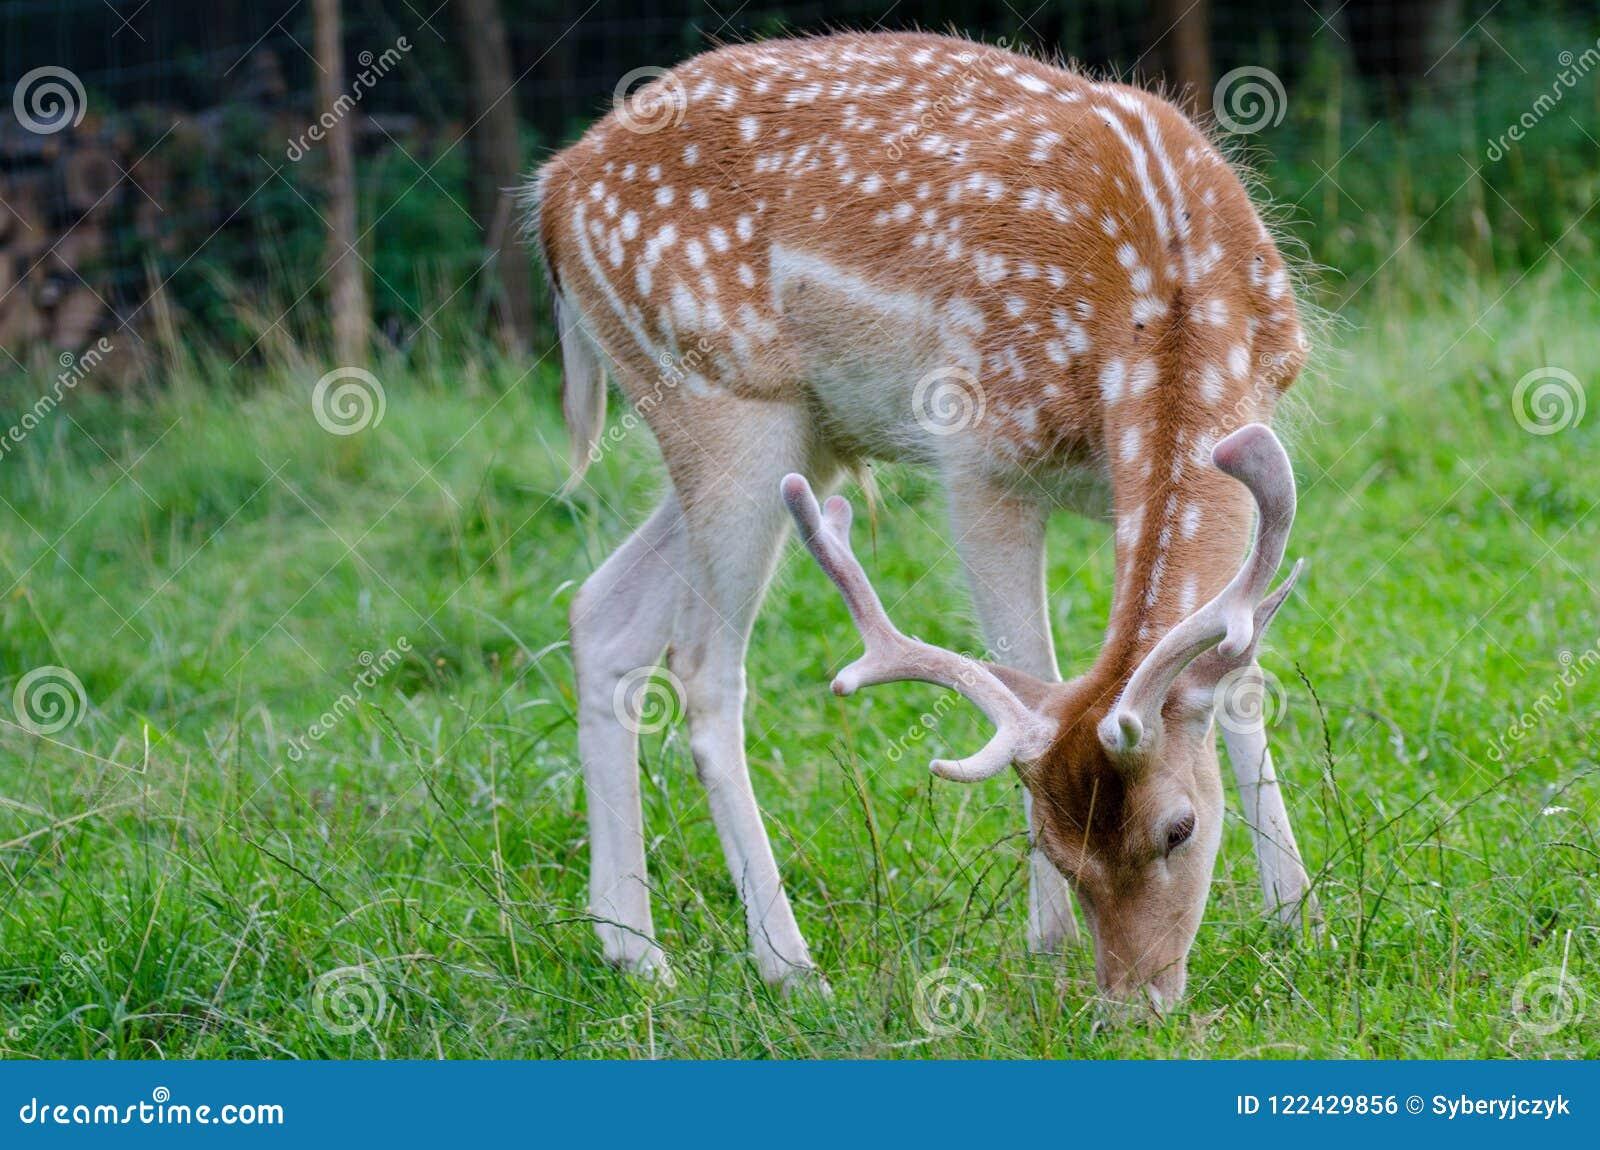 The fallow deer Dama dama